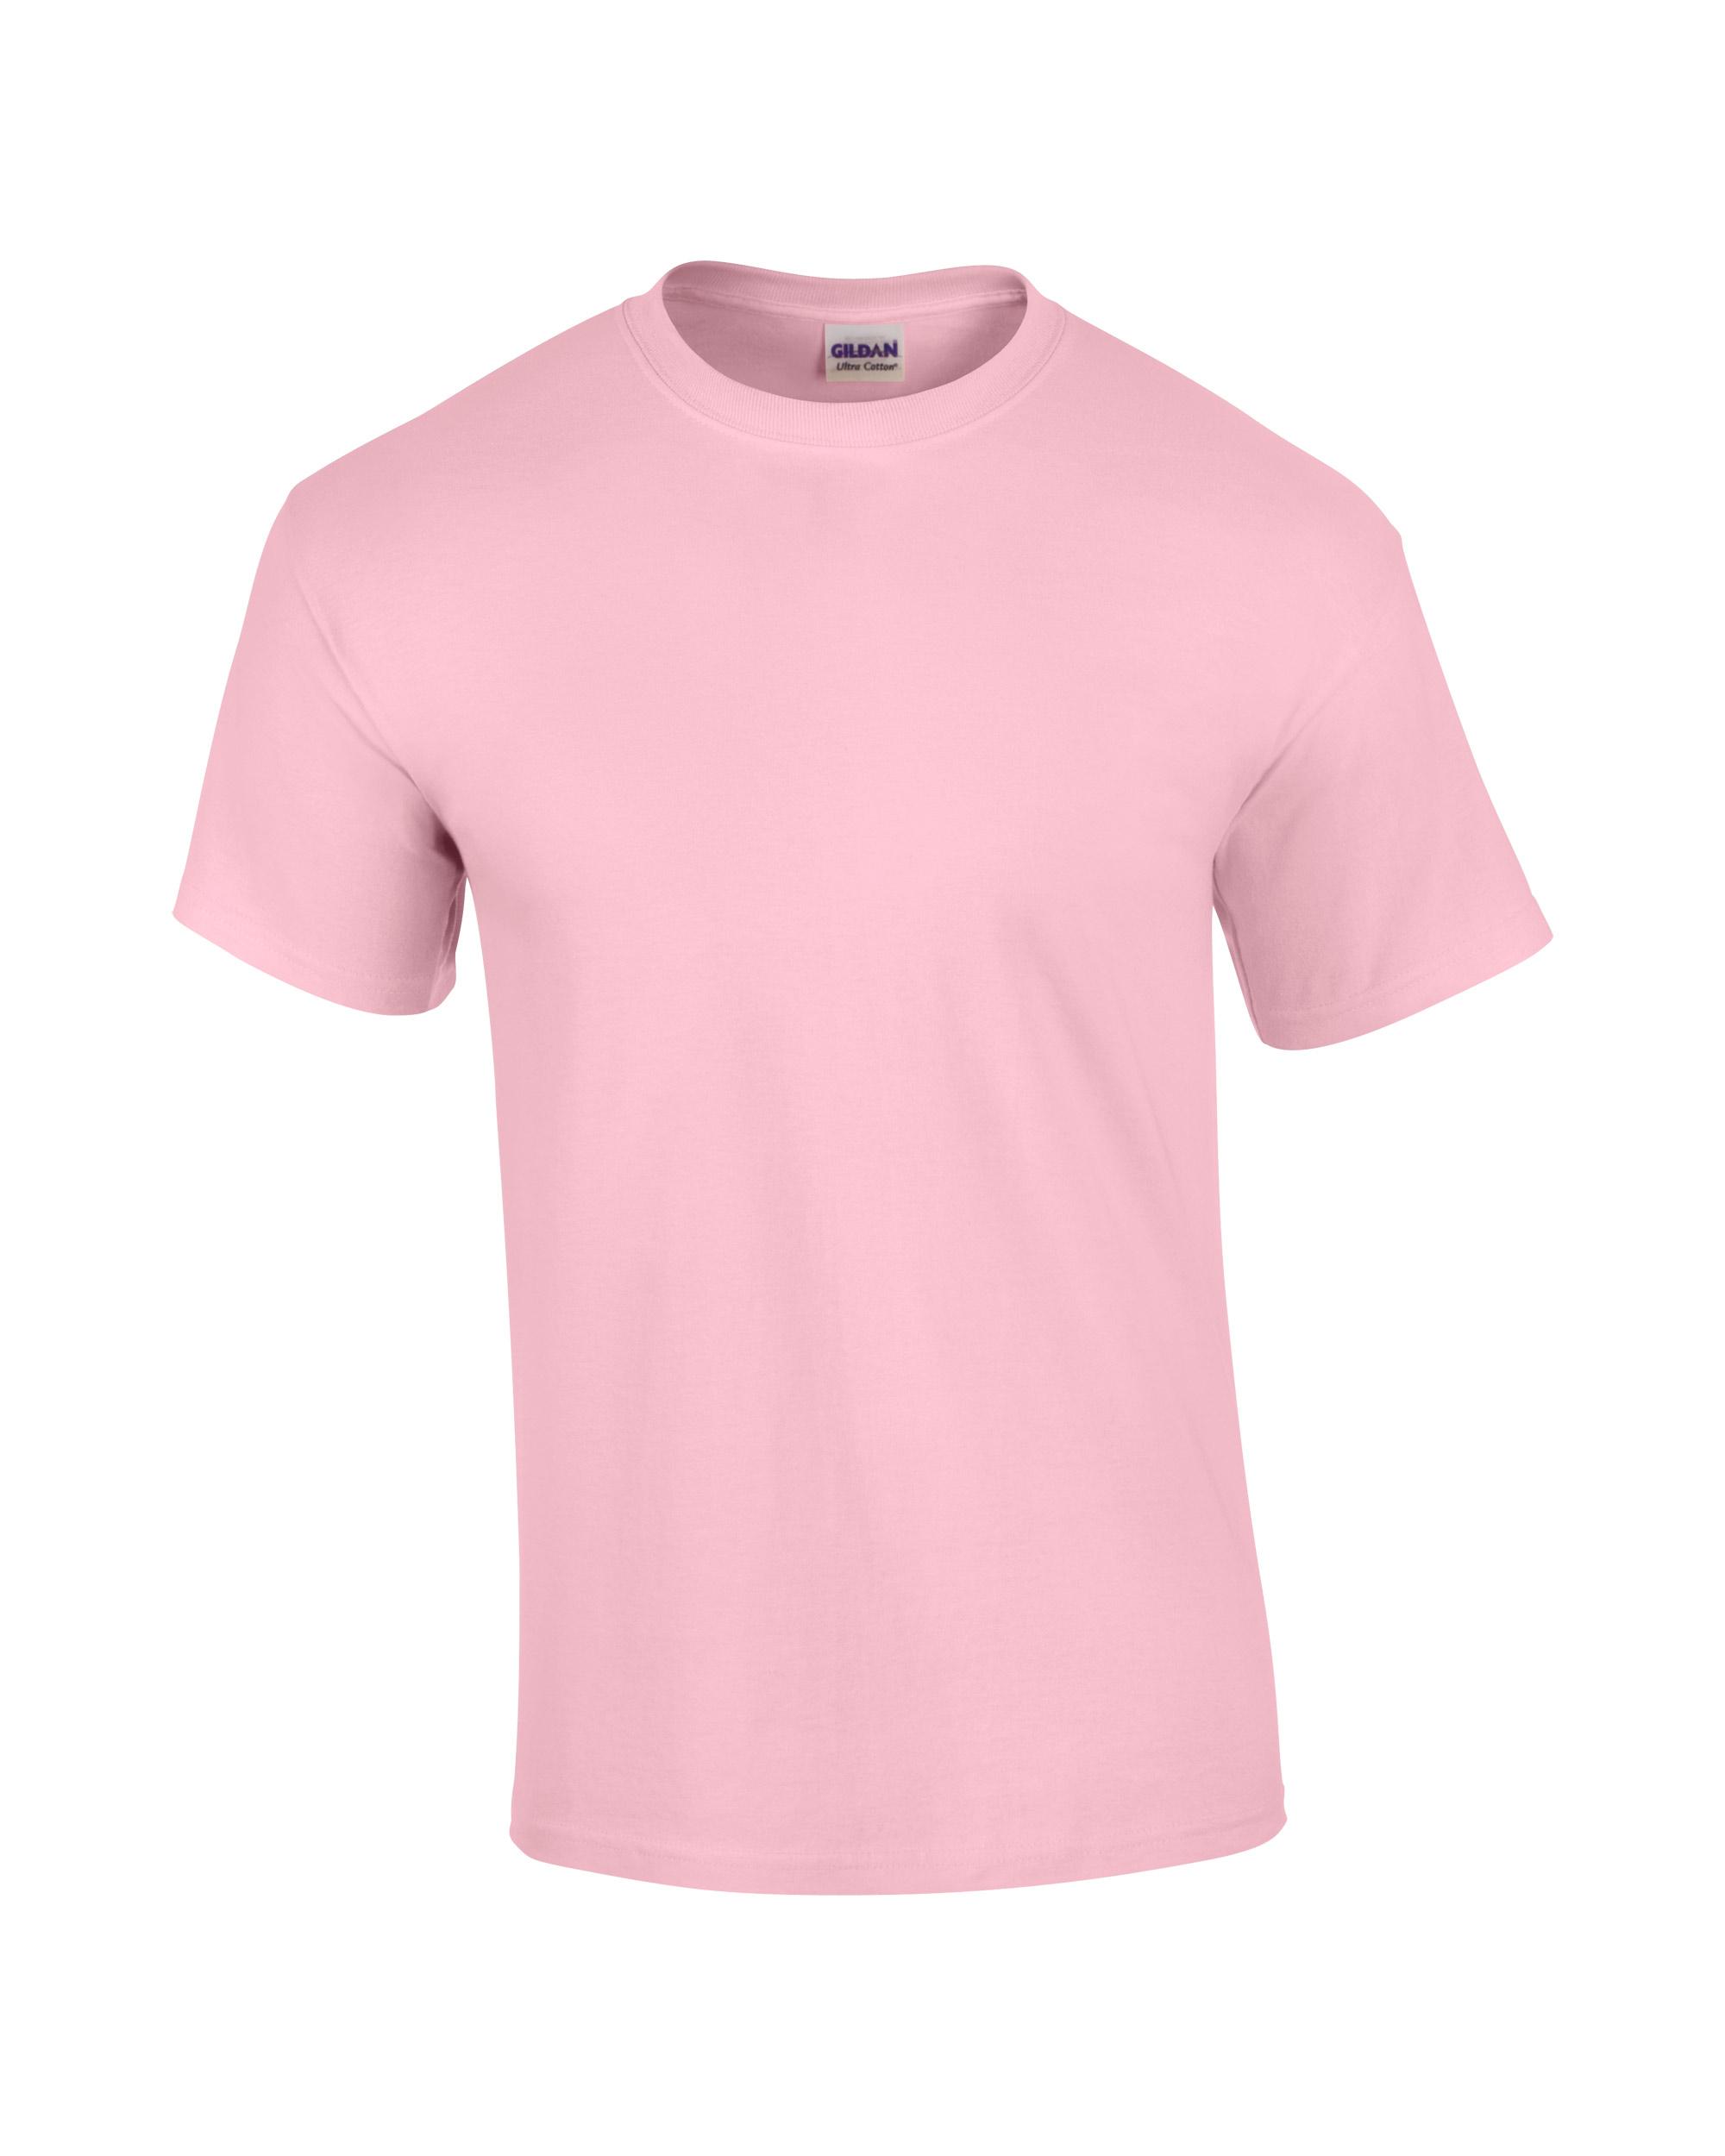 Design t shirt gildan -  2000 685c_light Pink 6 0 Oz Ultra Cotton Mens Shirts Ladies Shirts